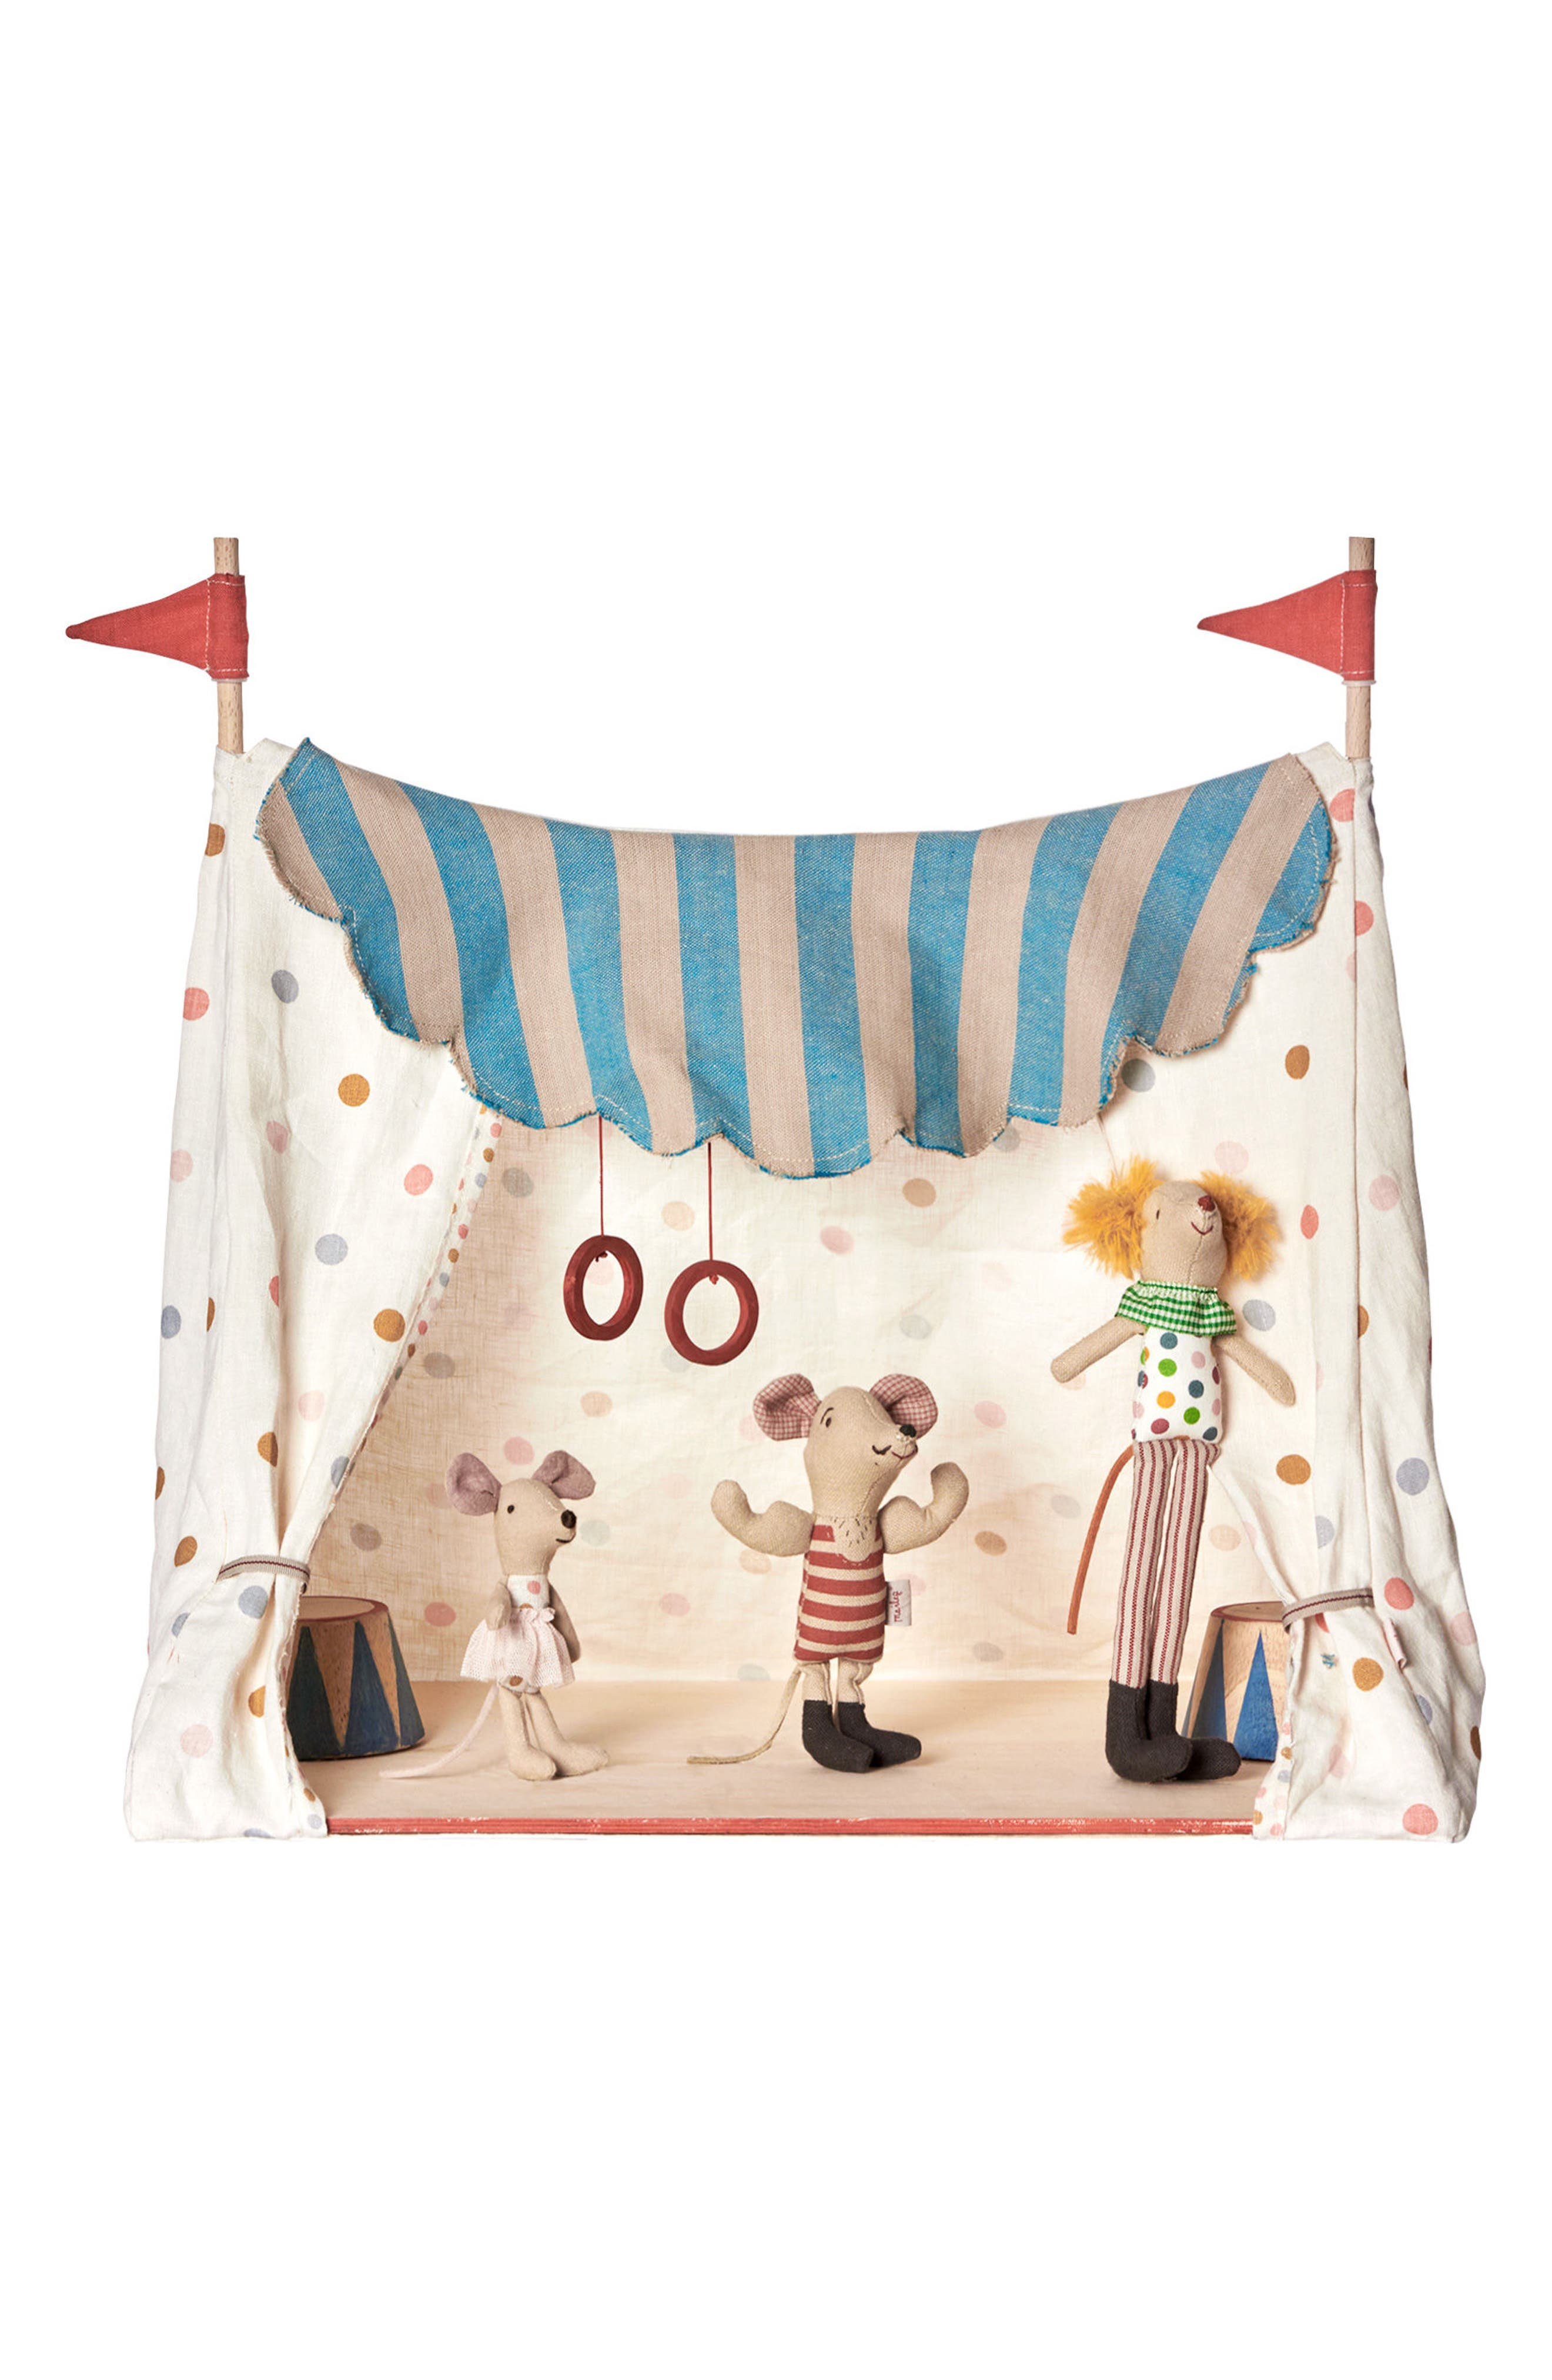 Circus Mice in a Tent,                         Main,                         color, Multi